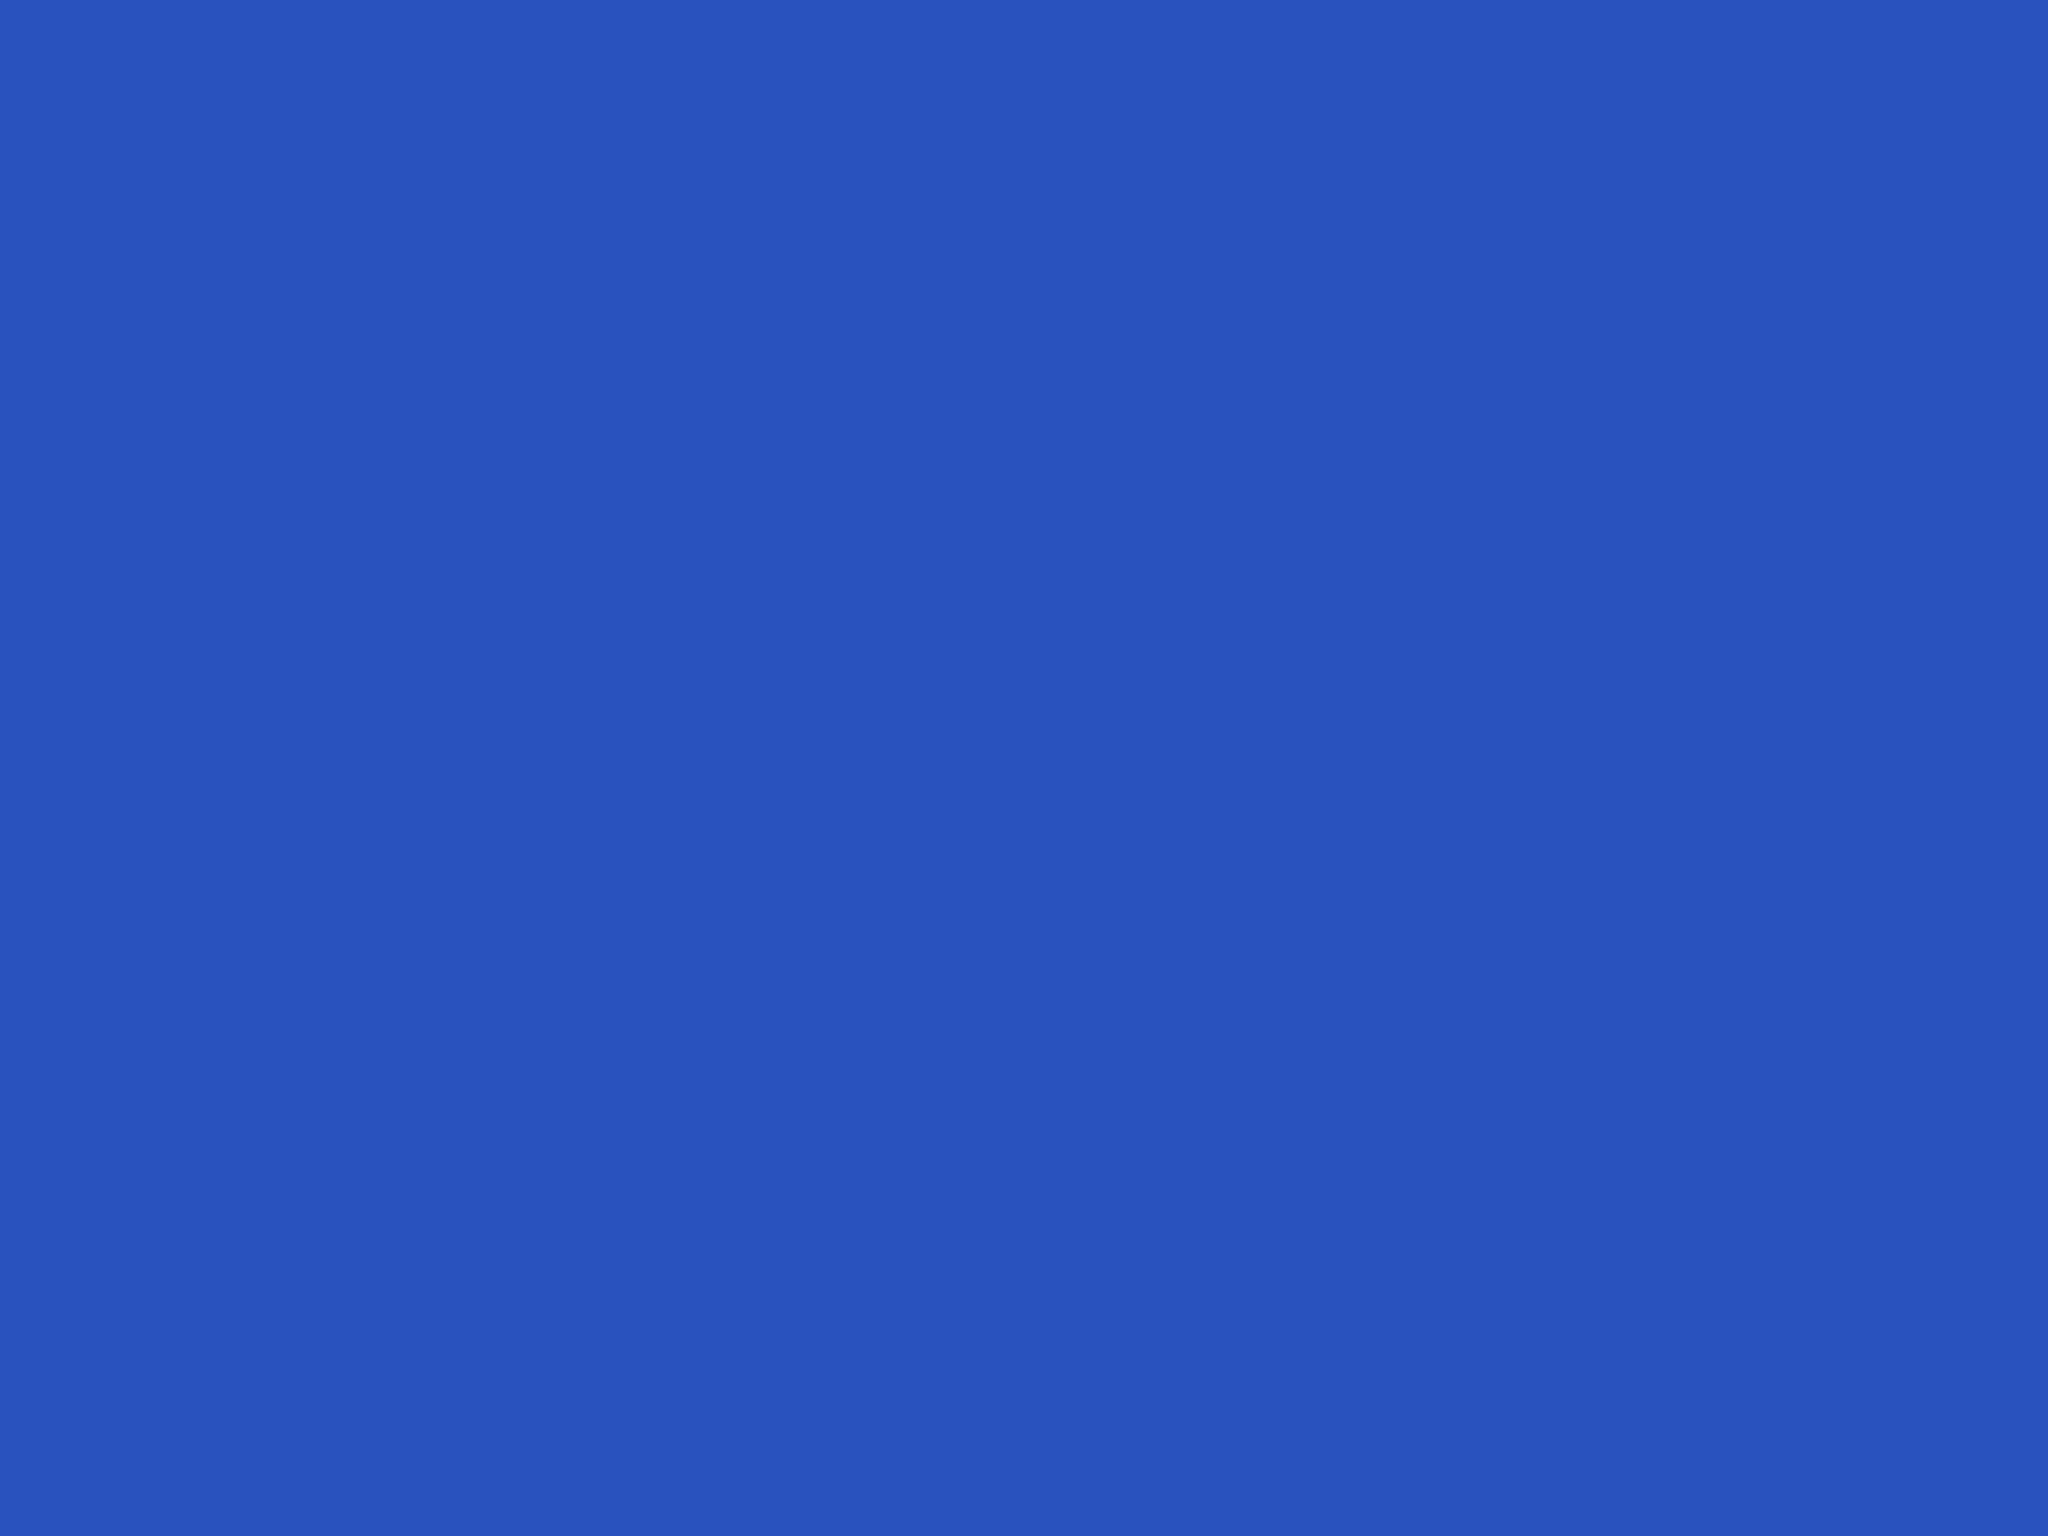 2048x1536 Cerulean Blue Solid Color Background